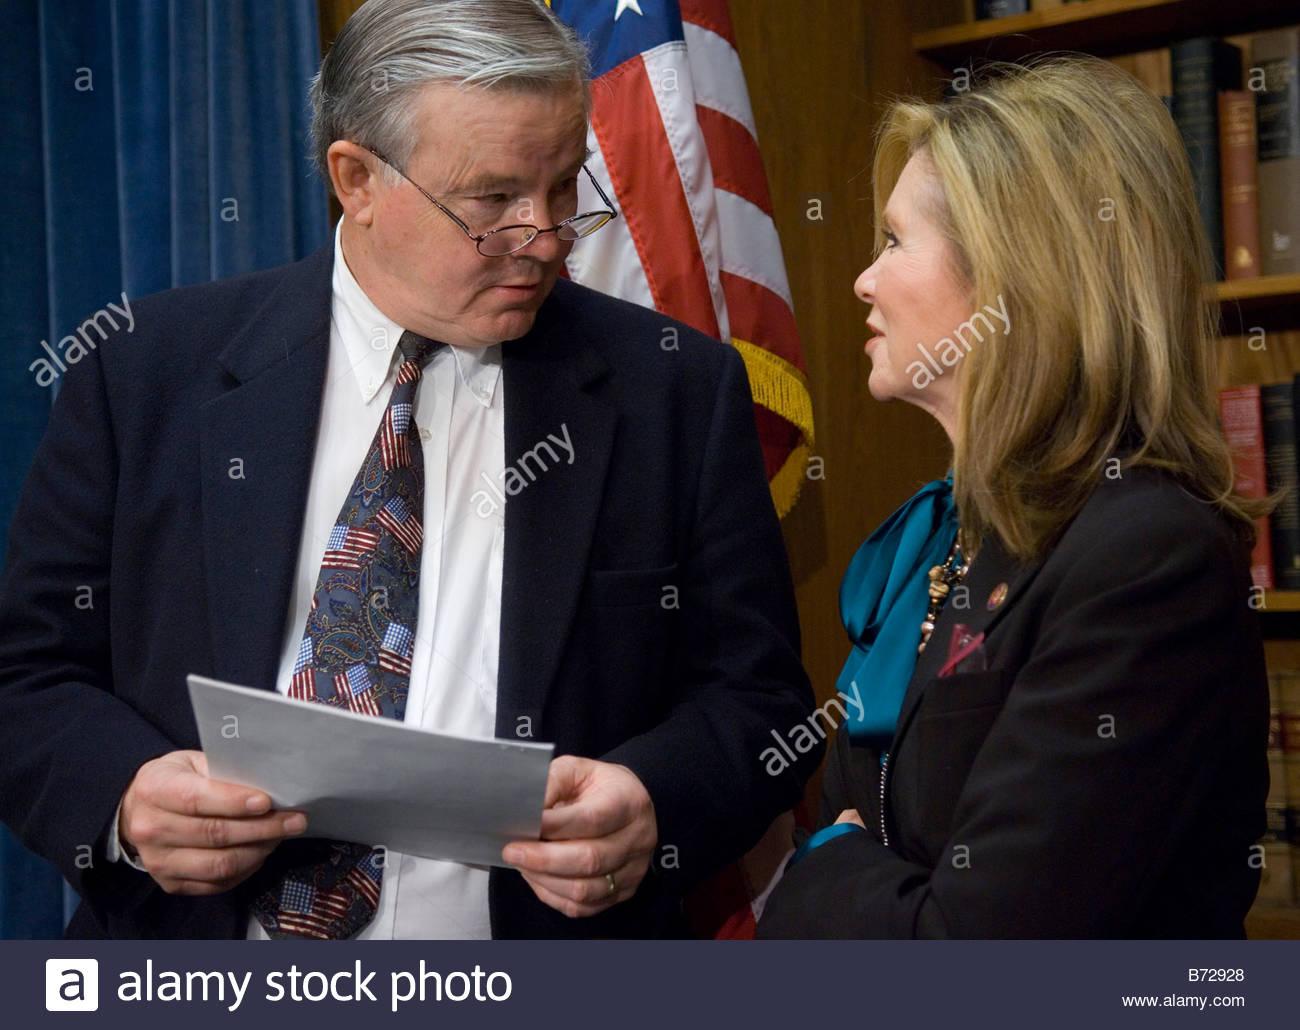 WASHINGTON DC Dec 06 House Energy Ranking Member Joe L Barton R Texas And  Rep Marsha Blackburn R Tenn Before A News Conference O